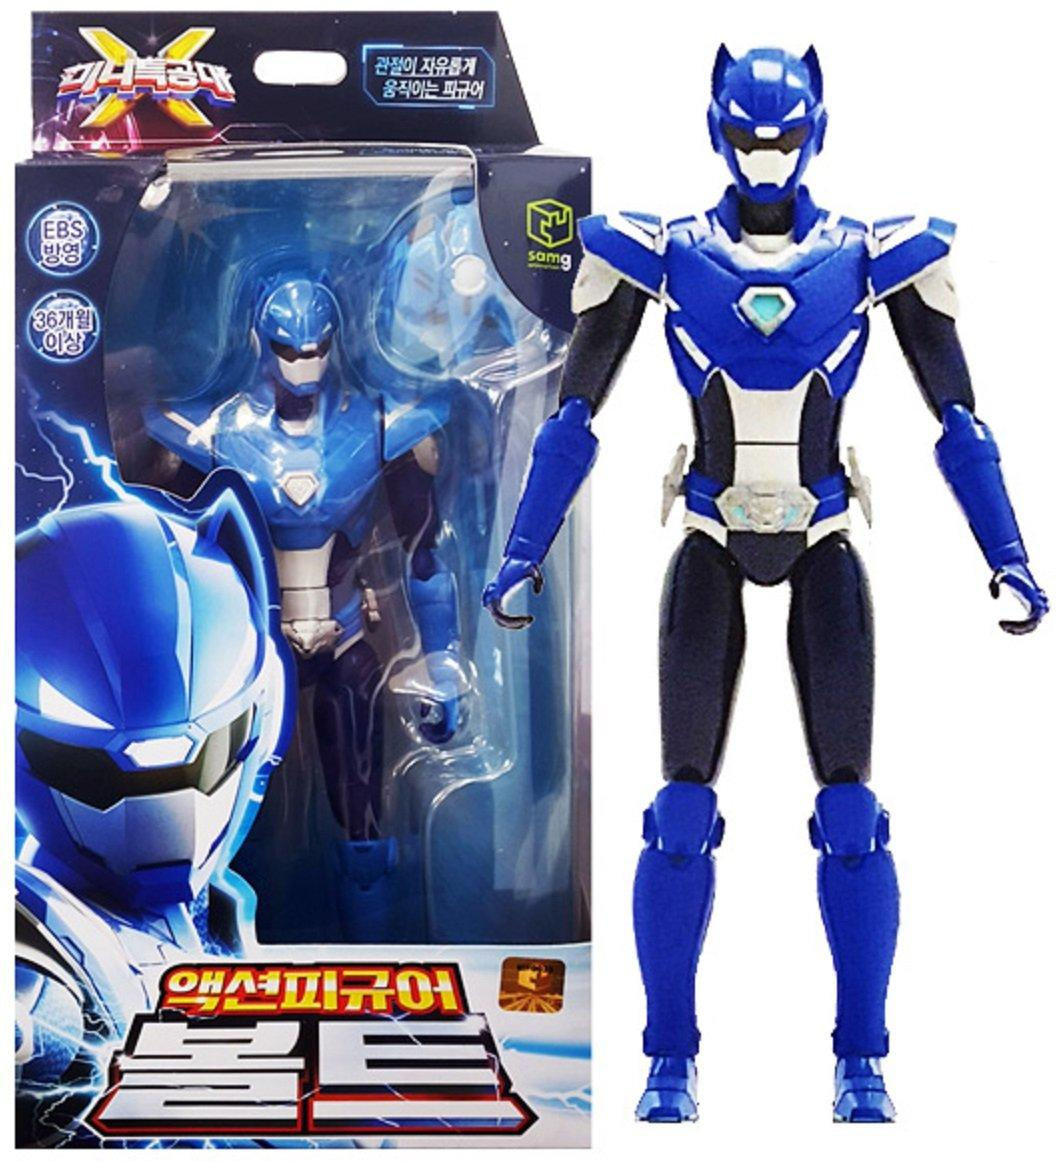 Фигурка игрушка робот Мини Форс Х Вольт Miniforce X Bolt Korean Robot